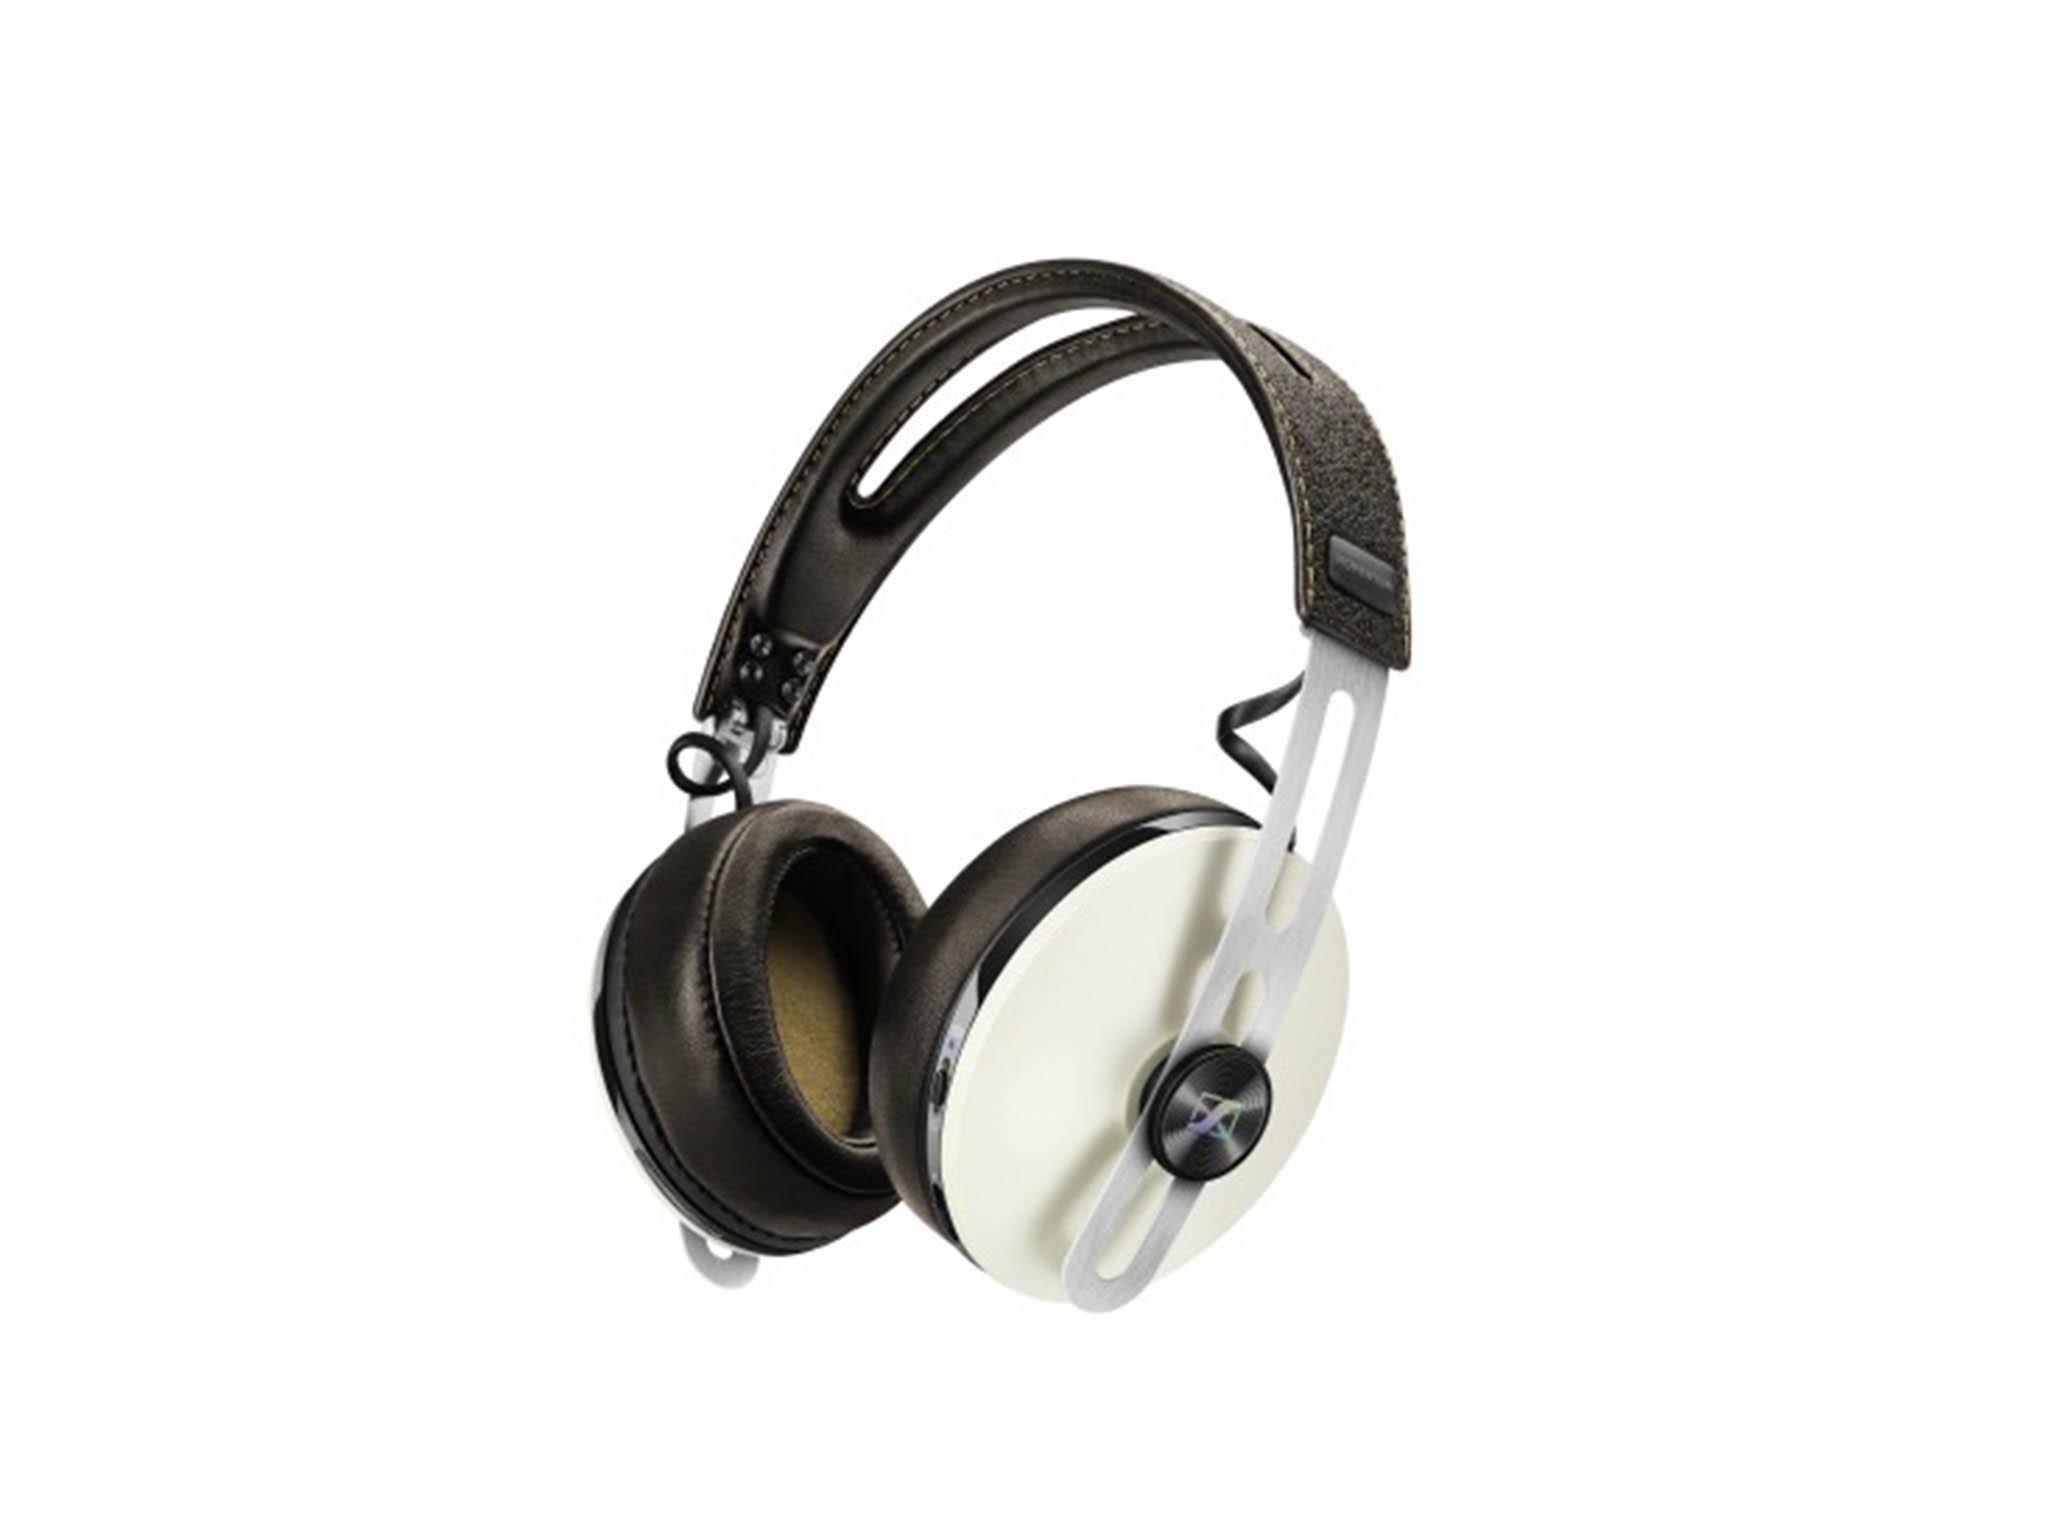 8 best wireless headphones | The Independent